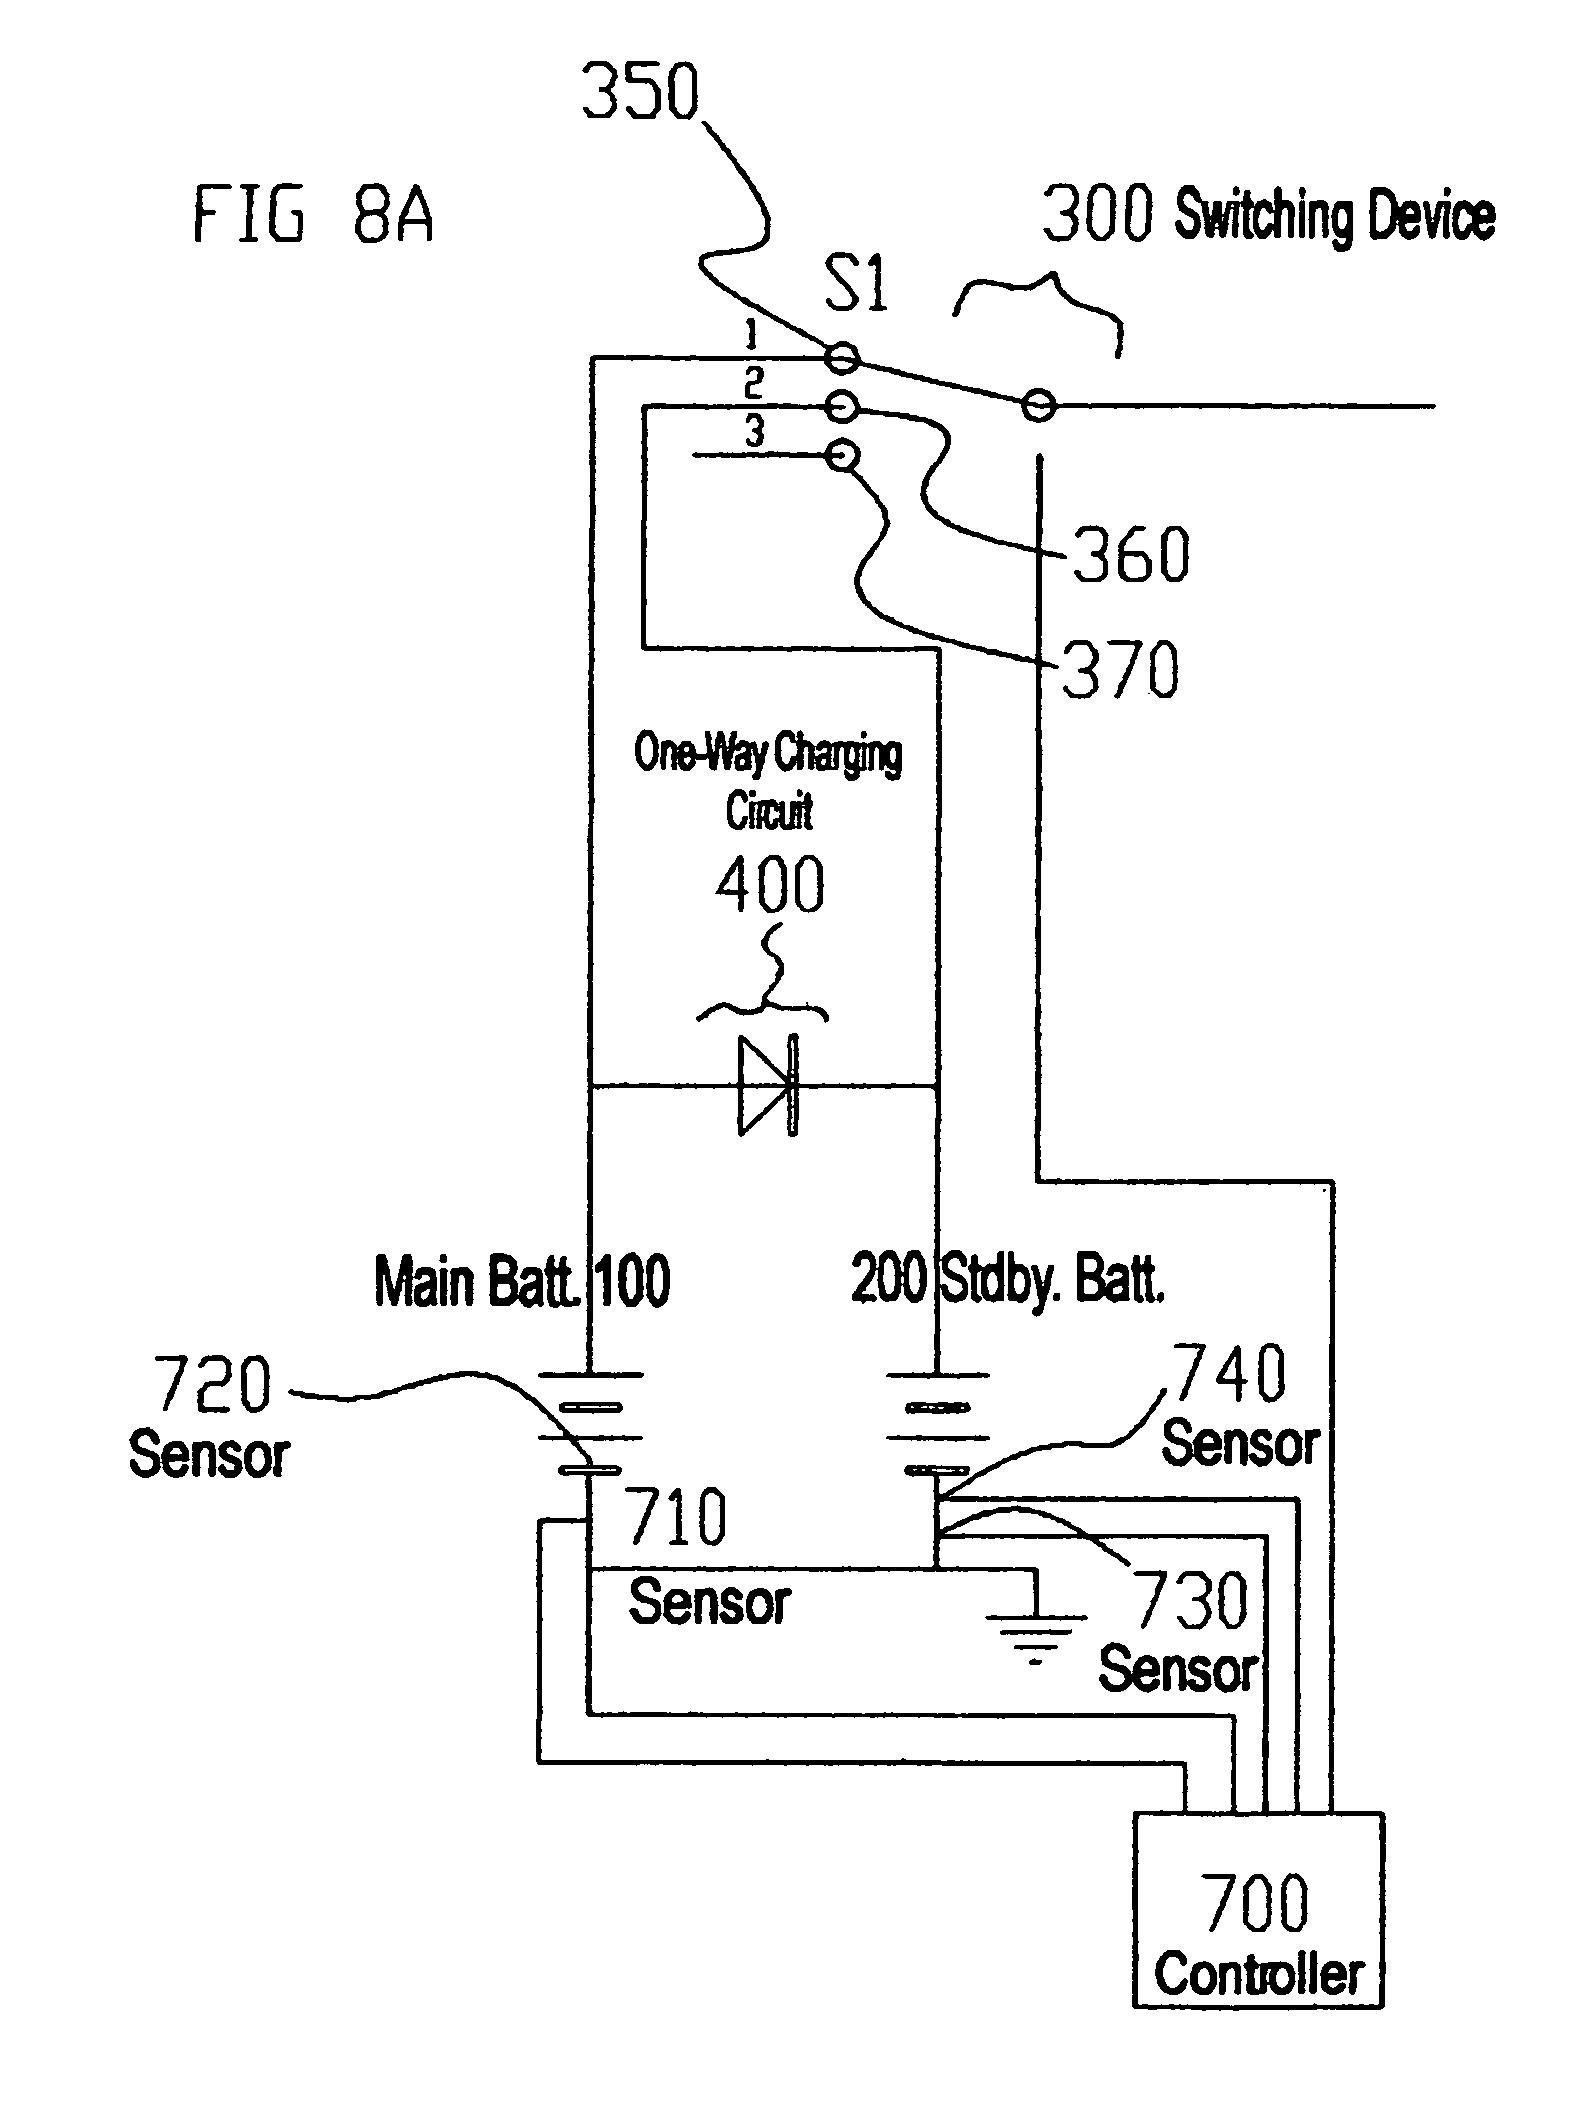 ouku single din wiring diagram photo album wire diagram images kd r330 wiring diagram jvc wiring diagrams projects on wiring diagram kd r330 wiring diagram jvc wiring diagrams projects on wiring diagram